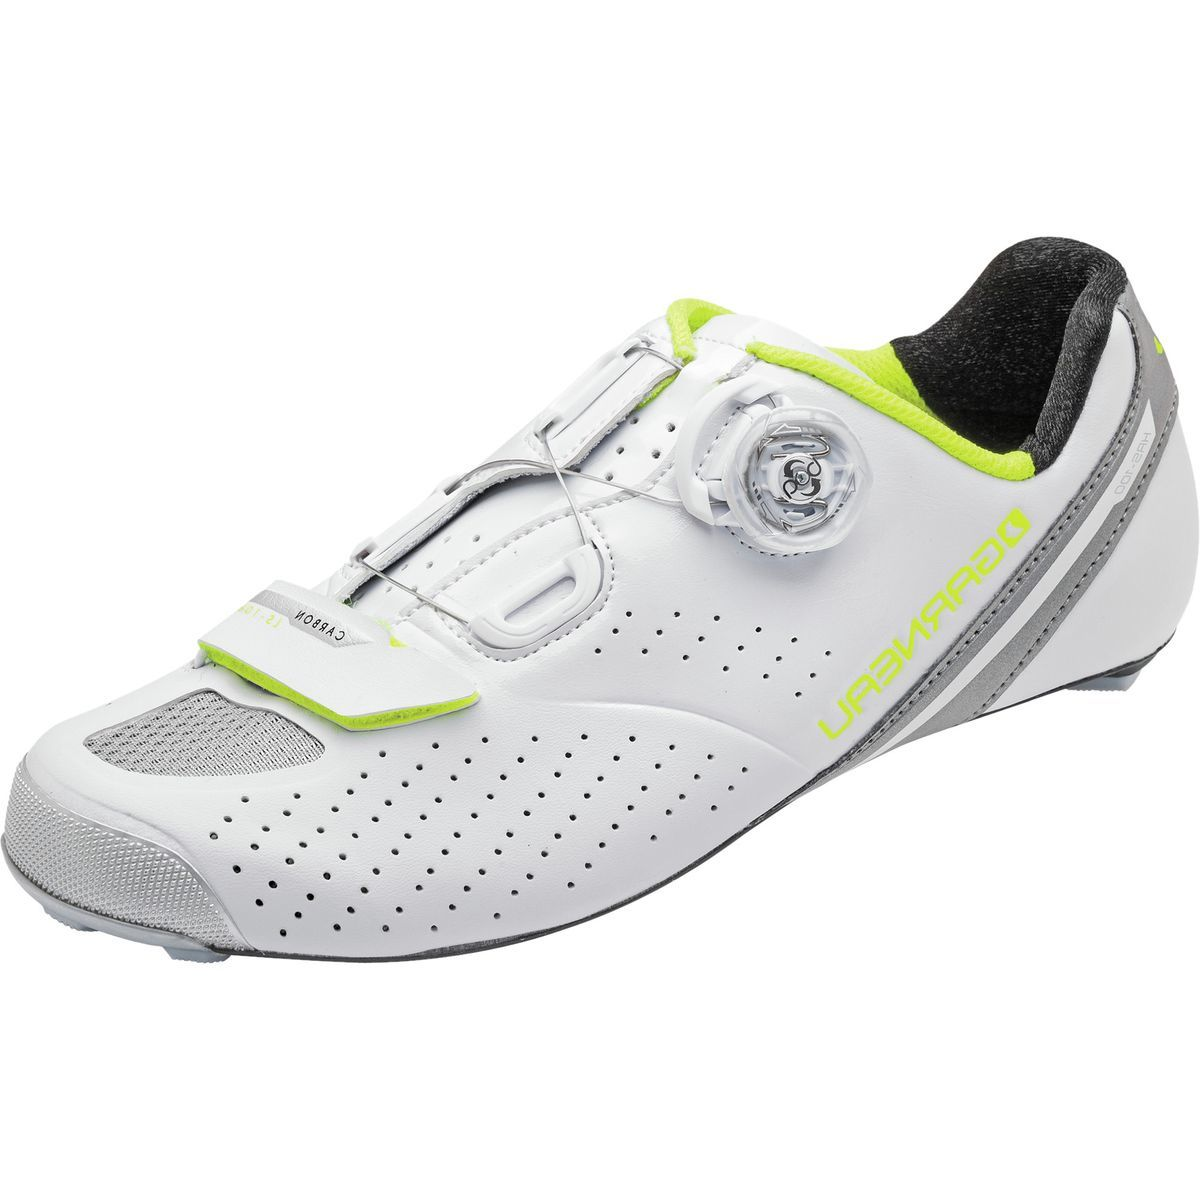 Louis Garneau Carbon LS-100 II Shoes - Women's